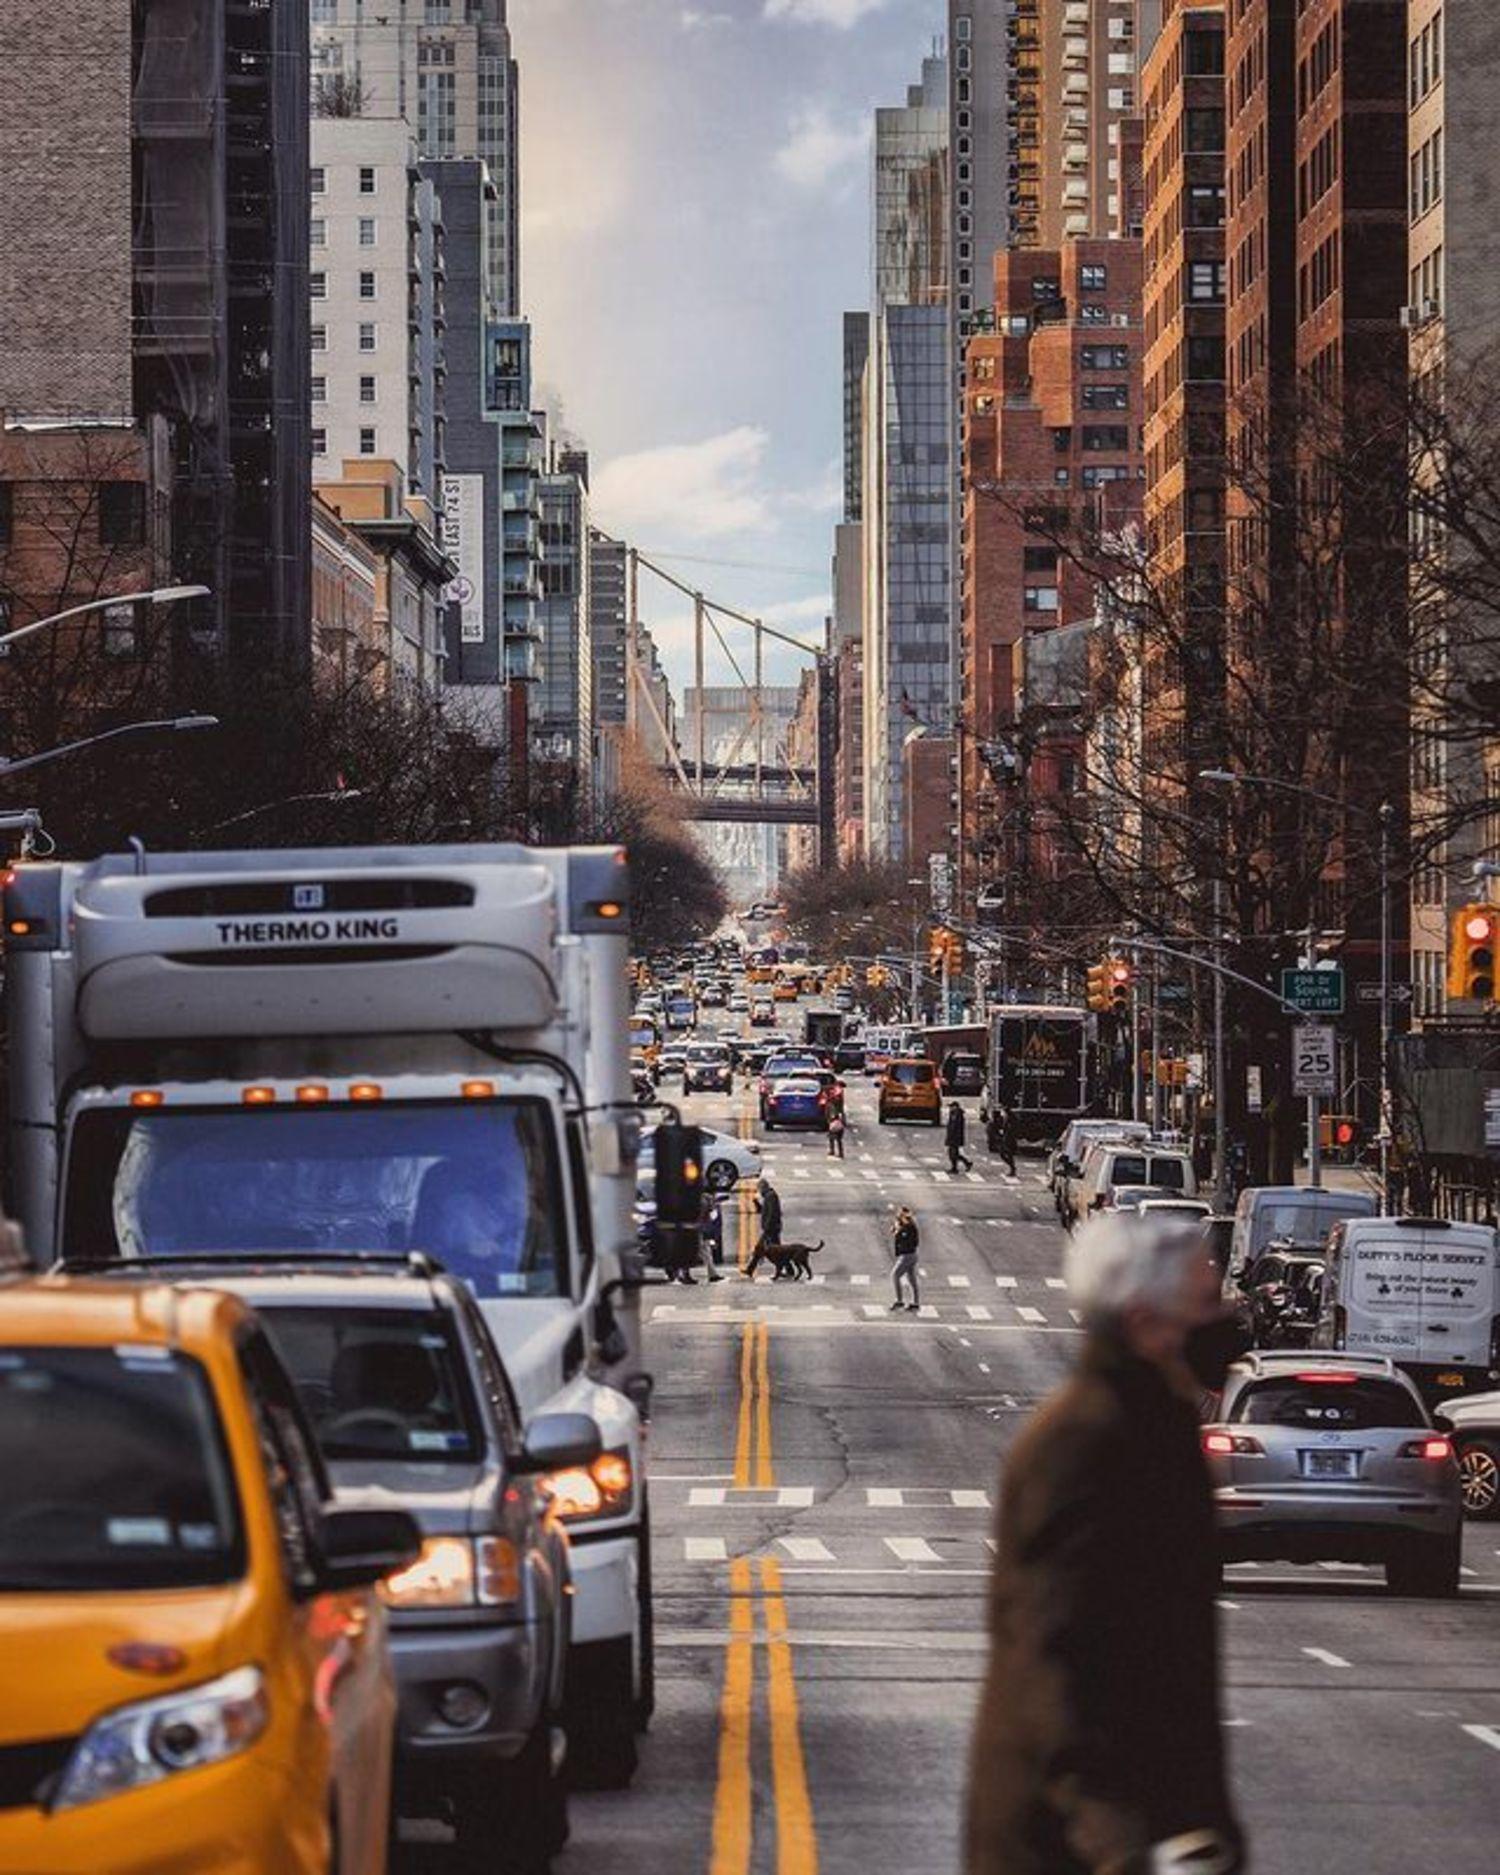 York Avenue, Upper East Side, Manhattan